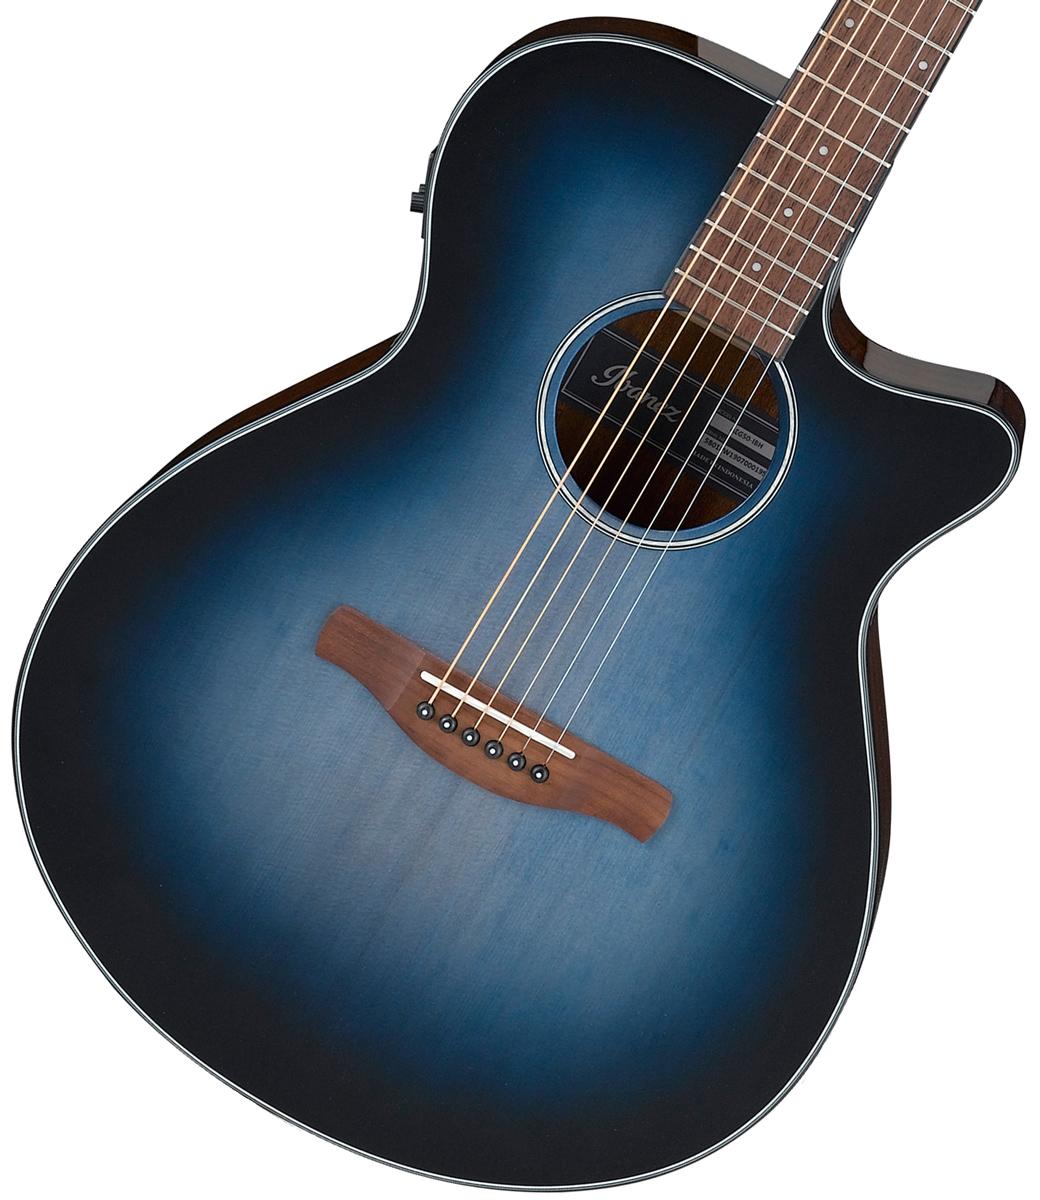 Ibanez / AEG50-IBH (Indigo Blue Burst High Gloss) アイバニーズ エレアコ 【お取り寄せ商品】